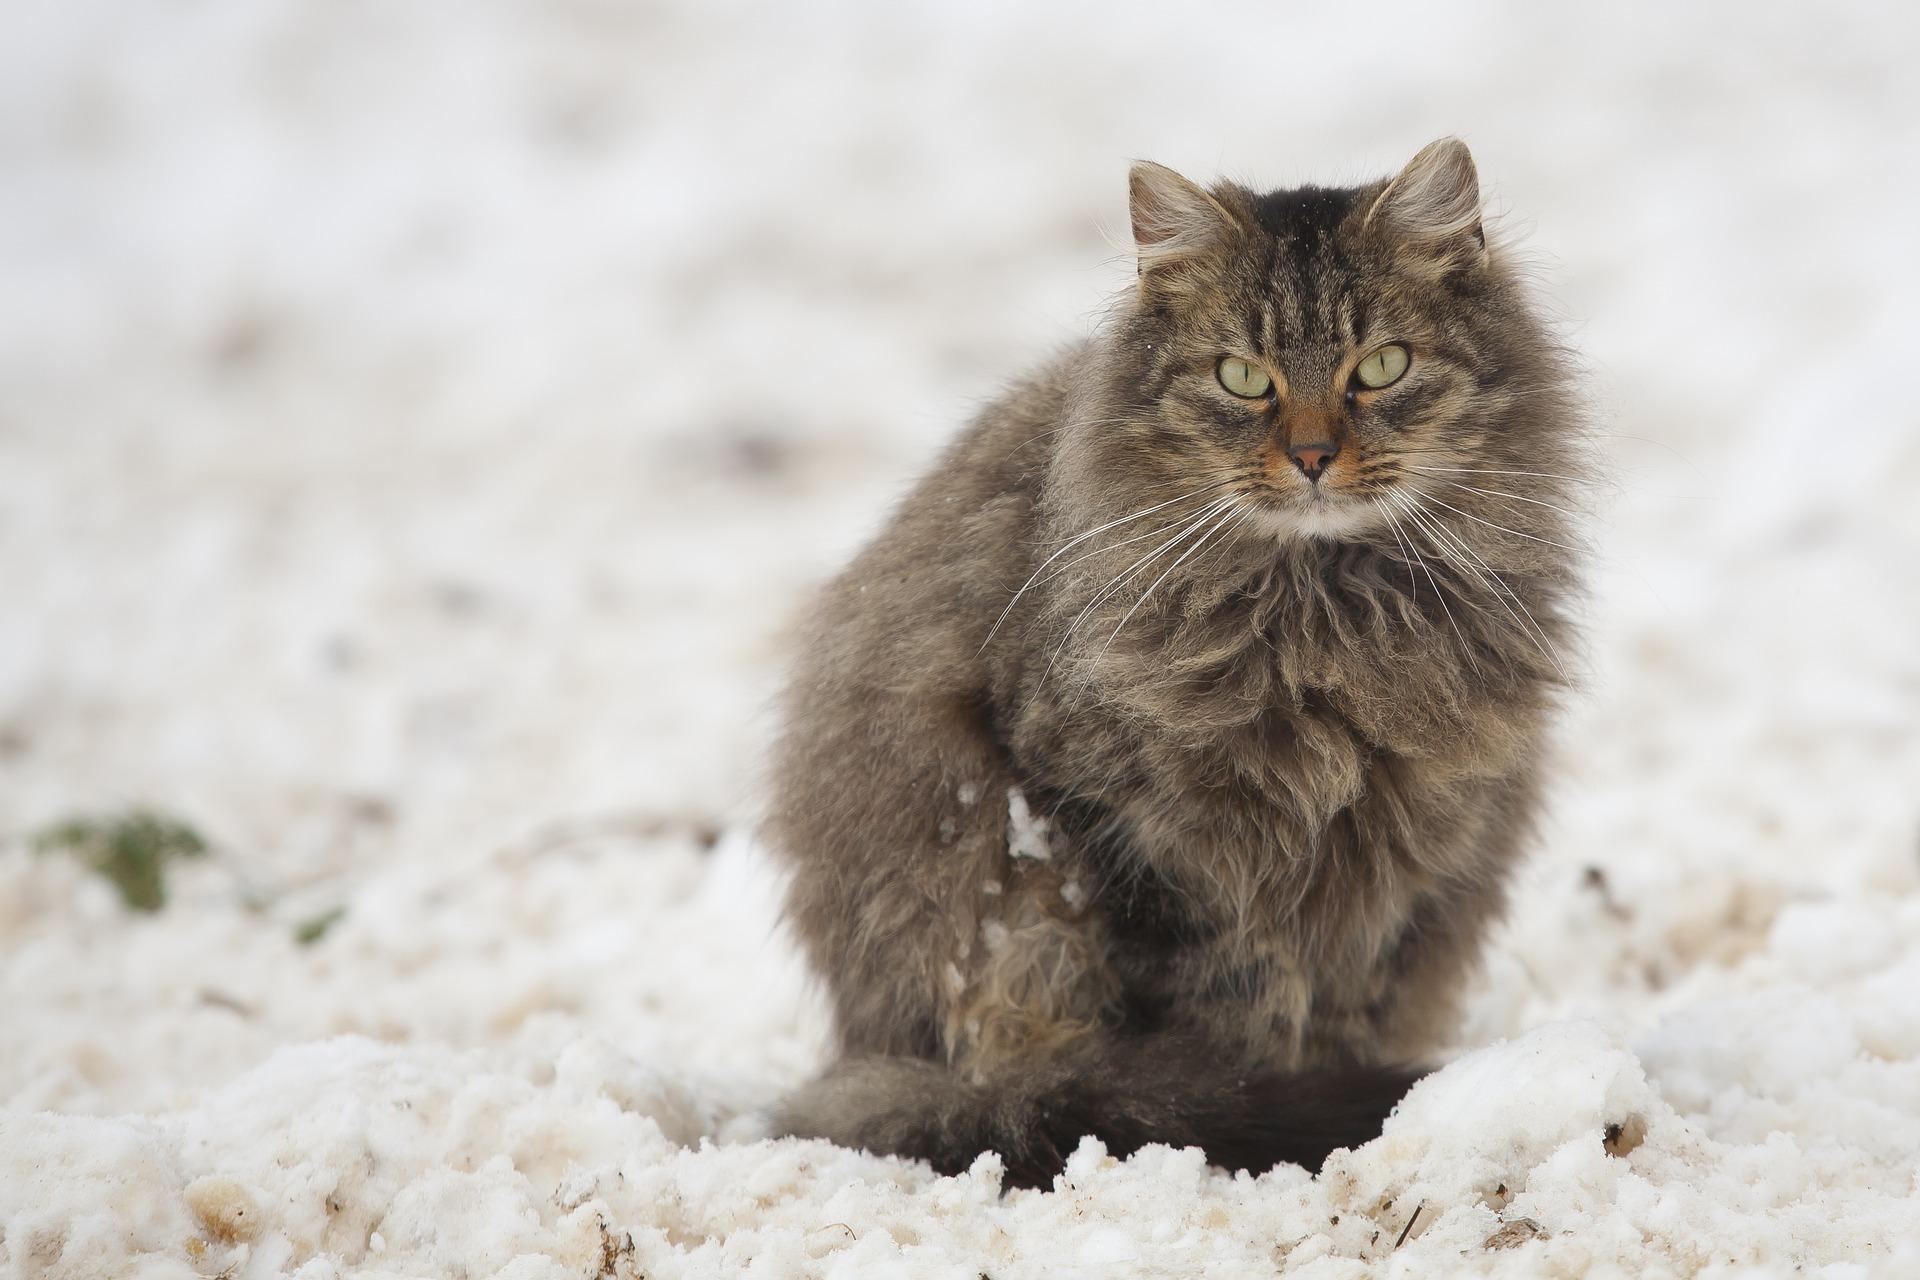 Холод неспешно наступает на Кострому